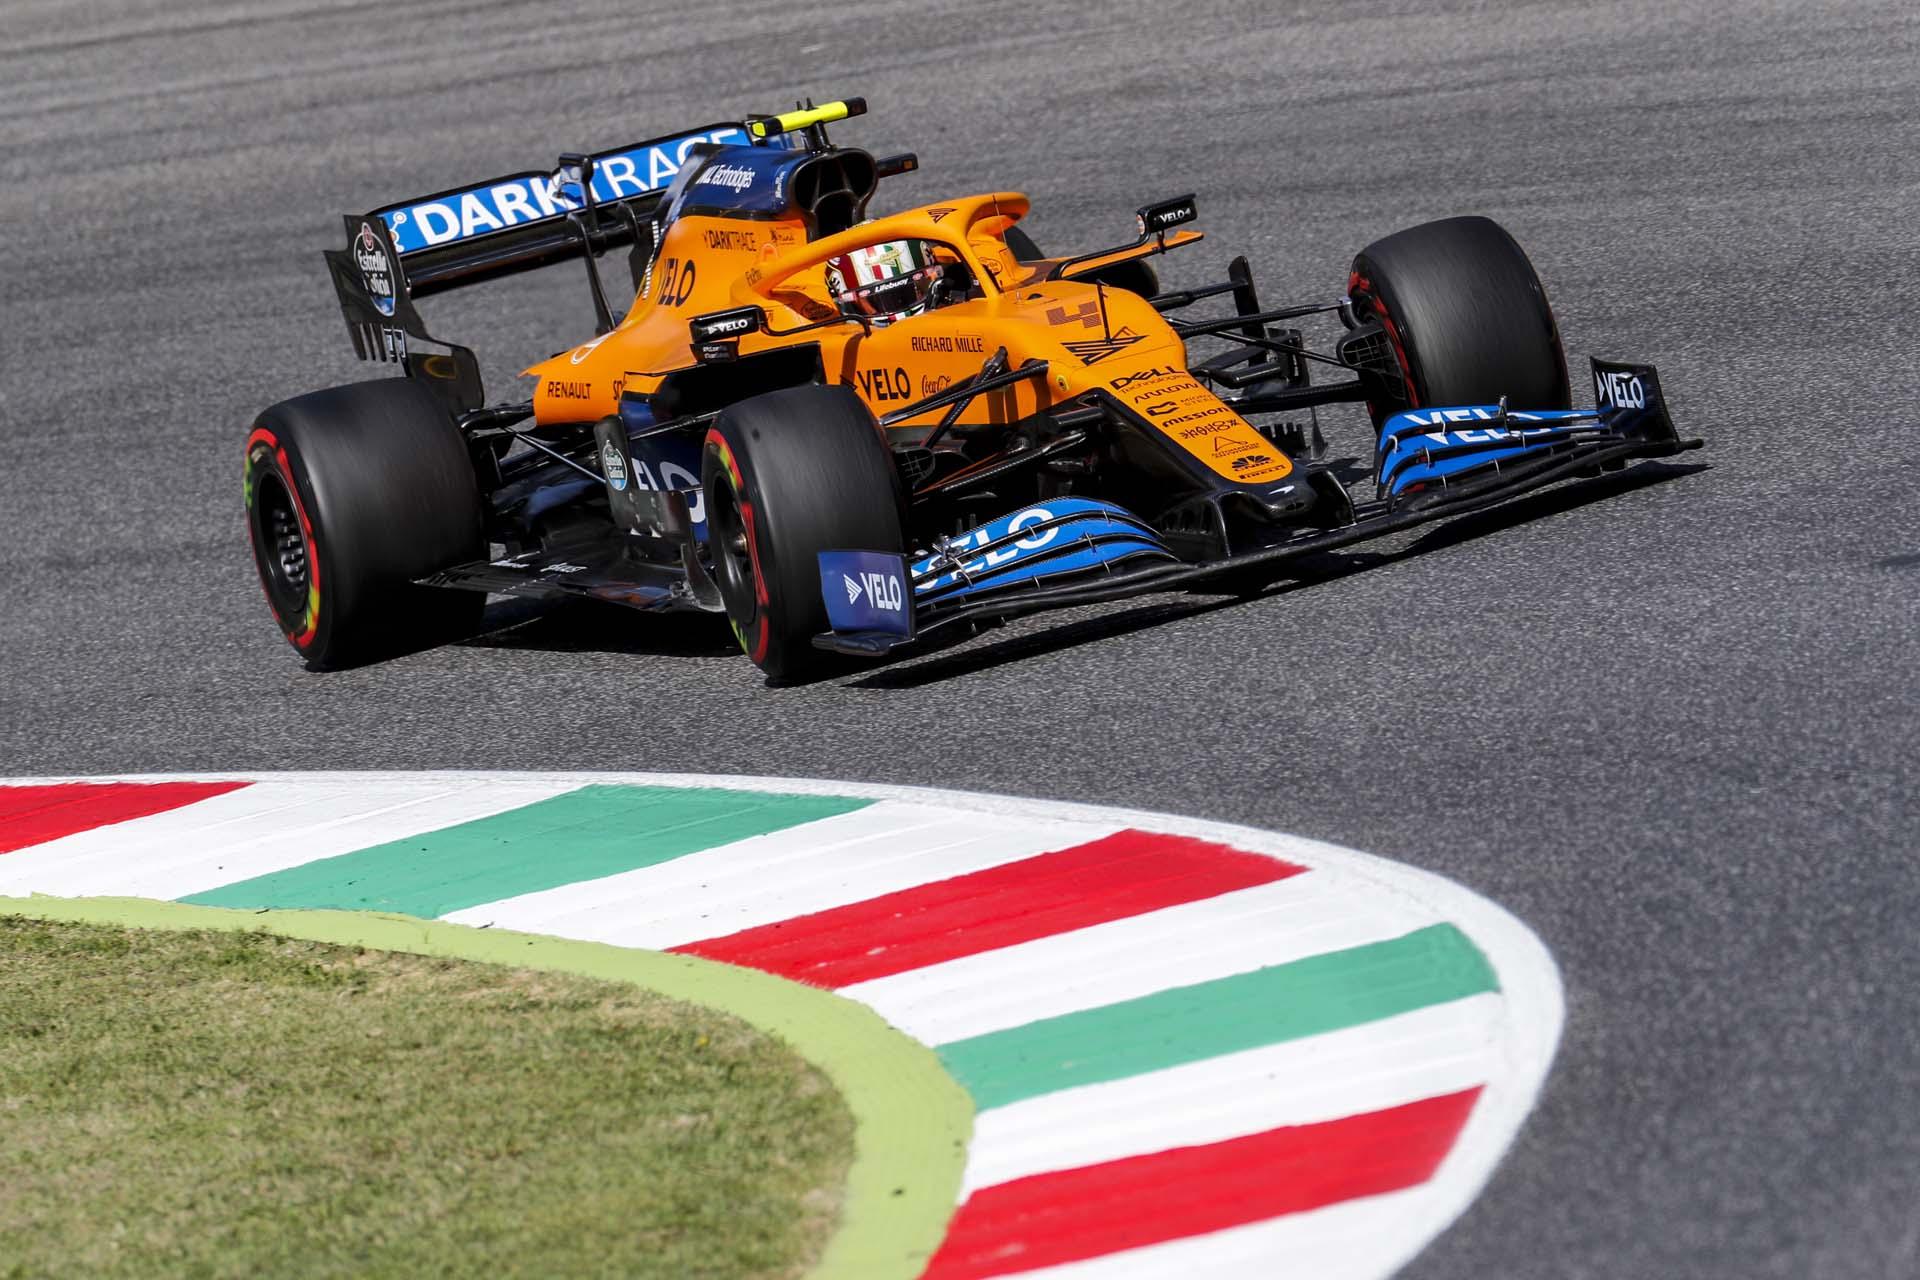 Lando Norris, McLaren MCL35, in a corner